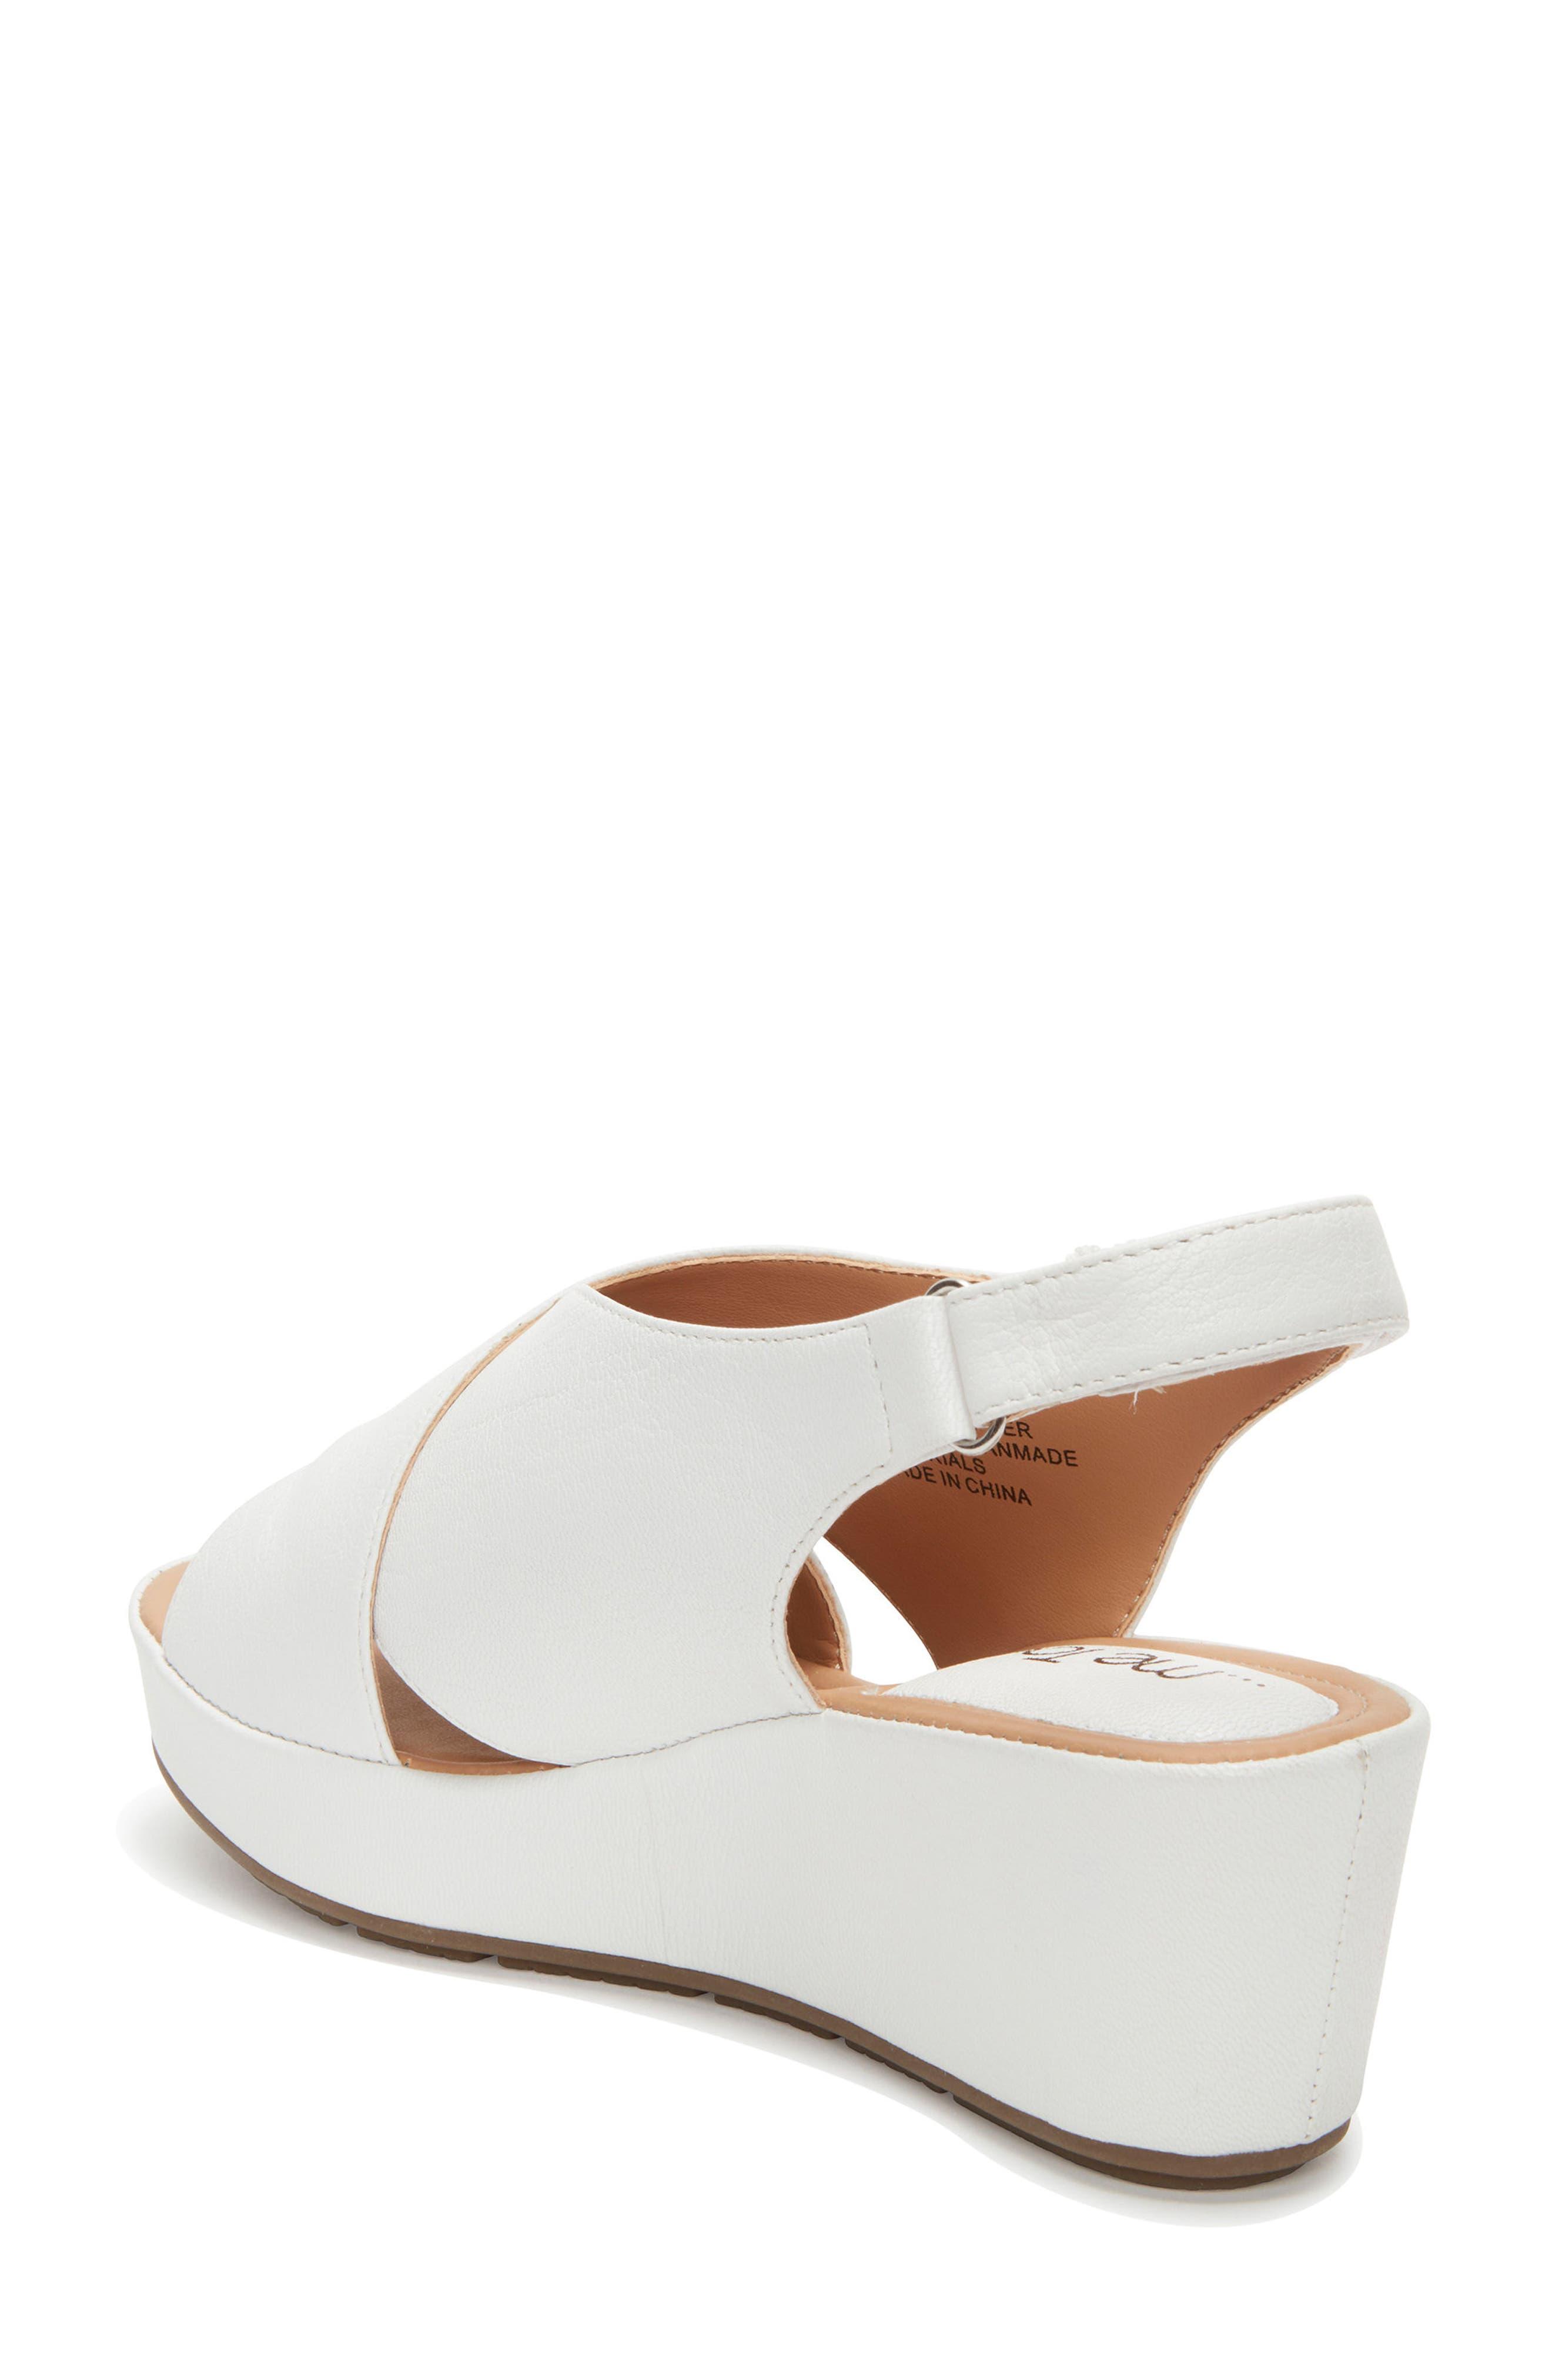 Arena Wedge Sandal,                             Alternate thumbnail 2, color,                             White Leather